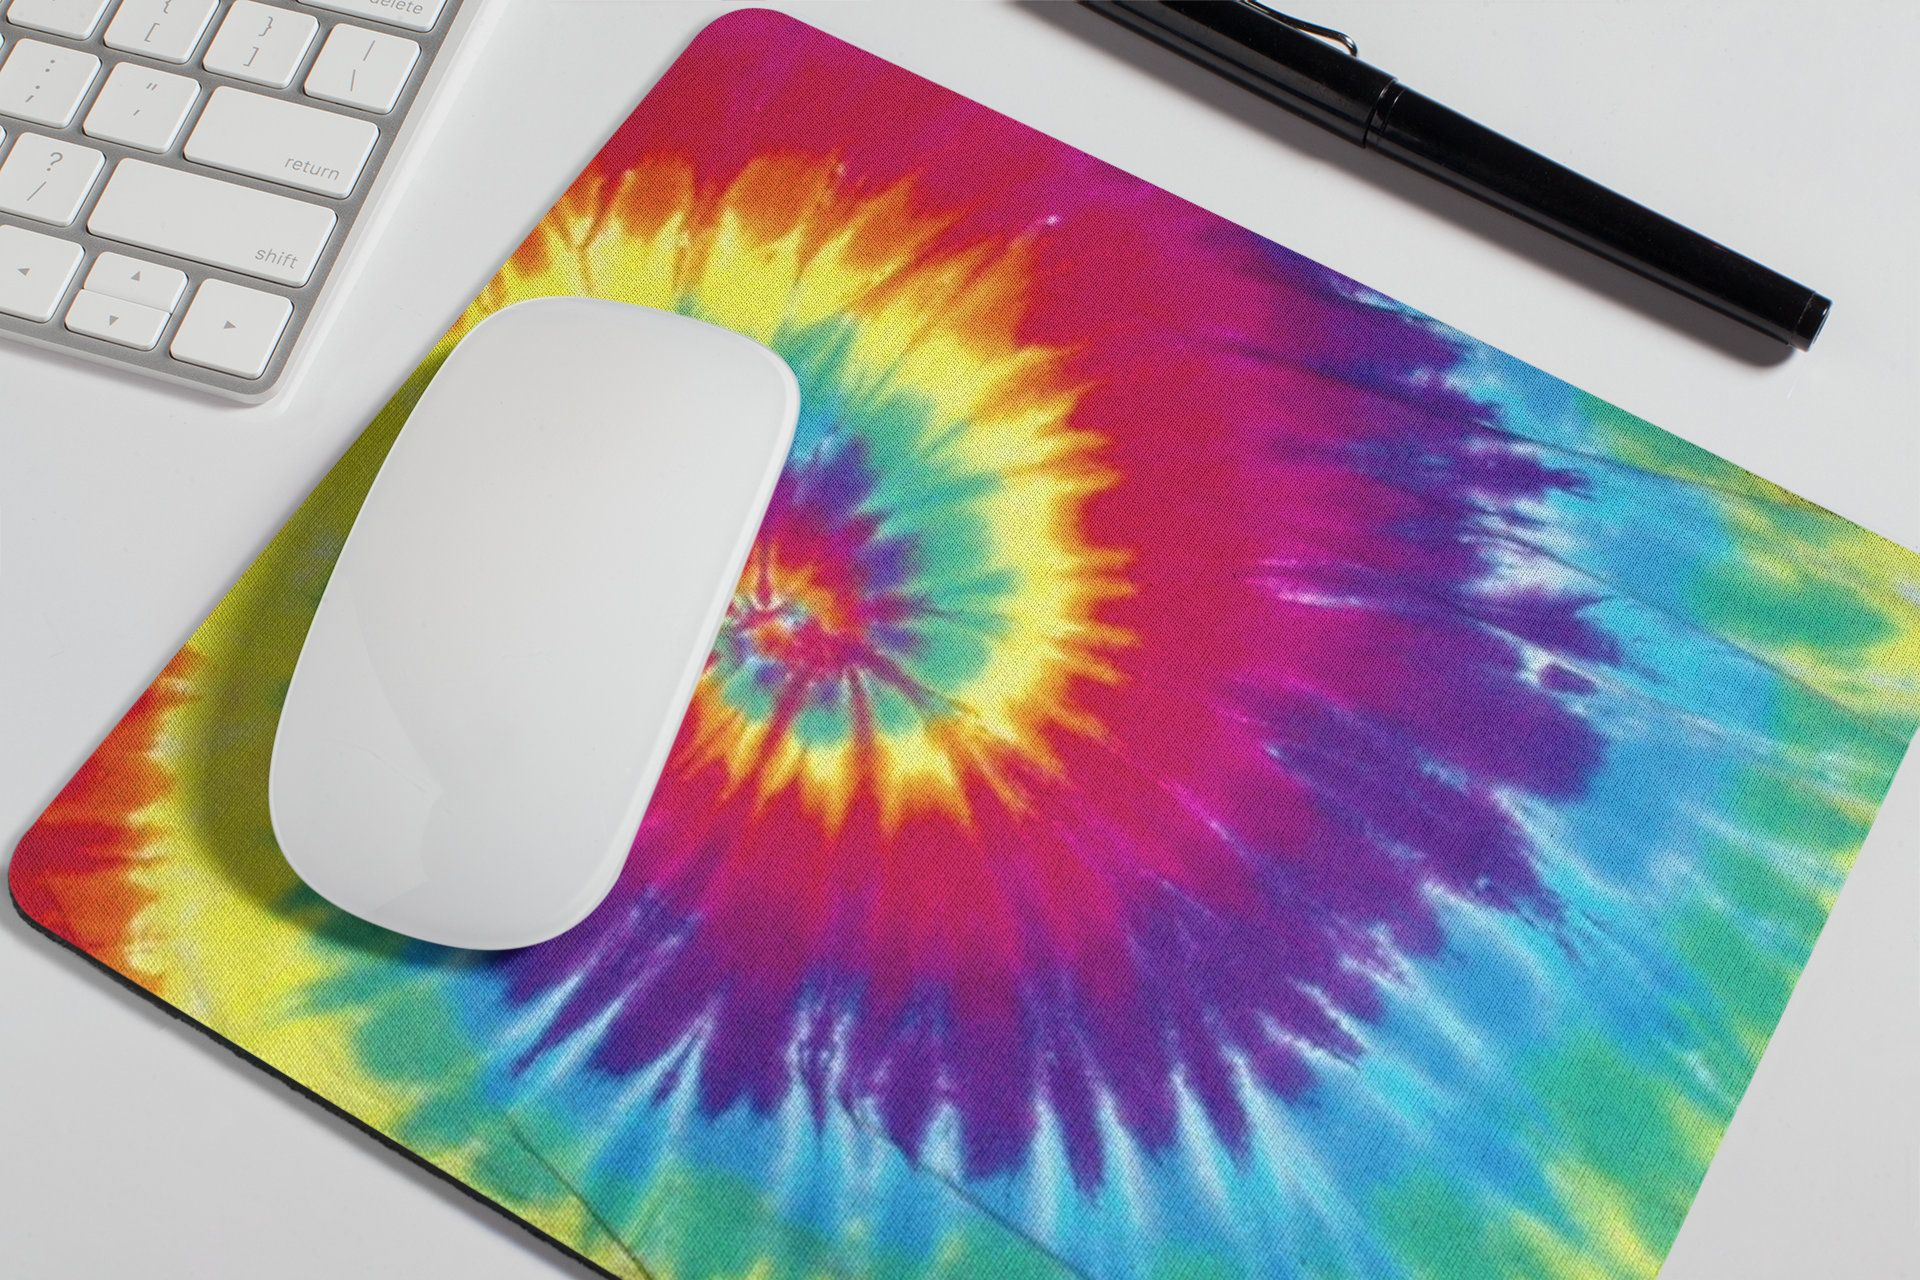 Cute Mousepad Pop Art Banana Mouse Pad Office Decor for Women Desk Accessories Gift